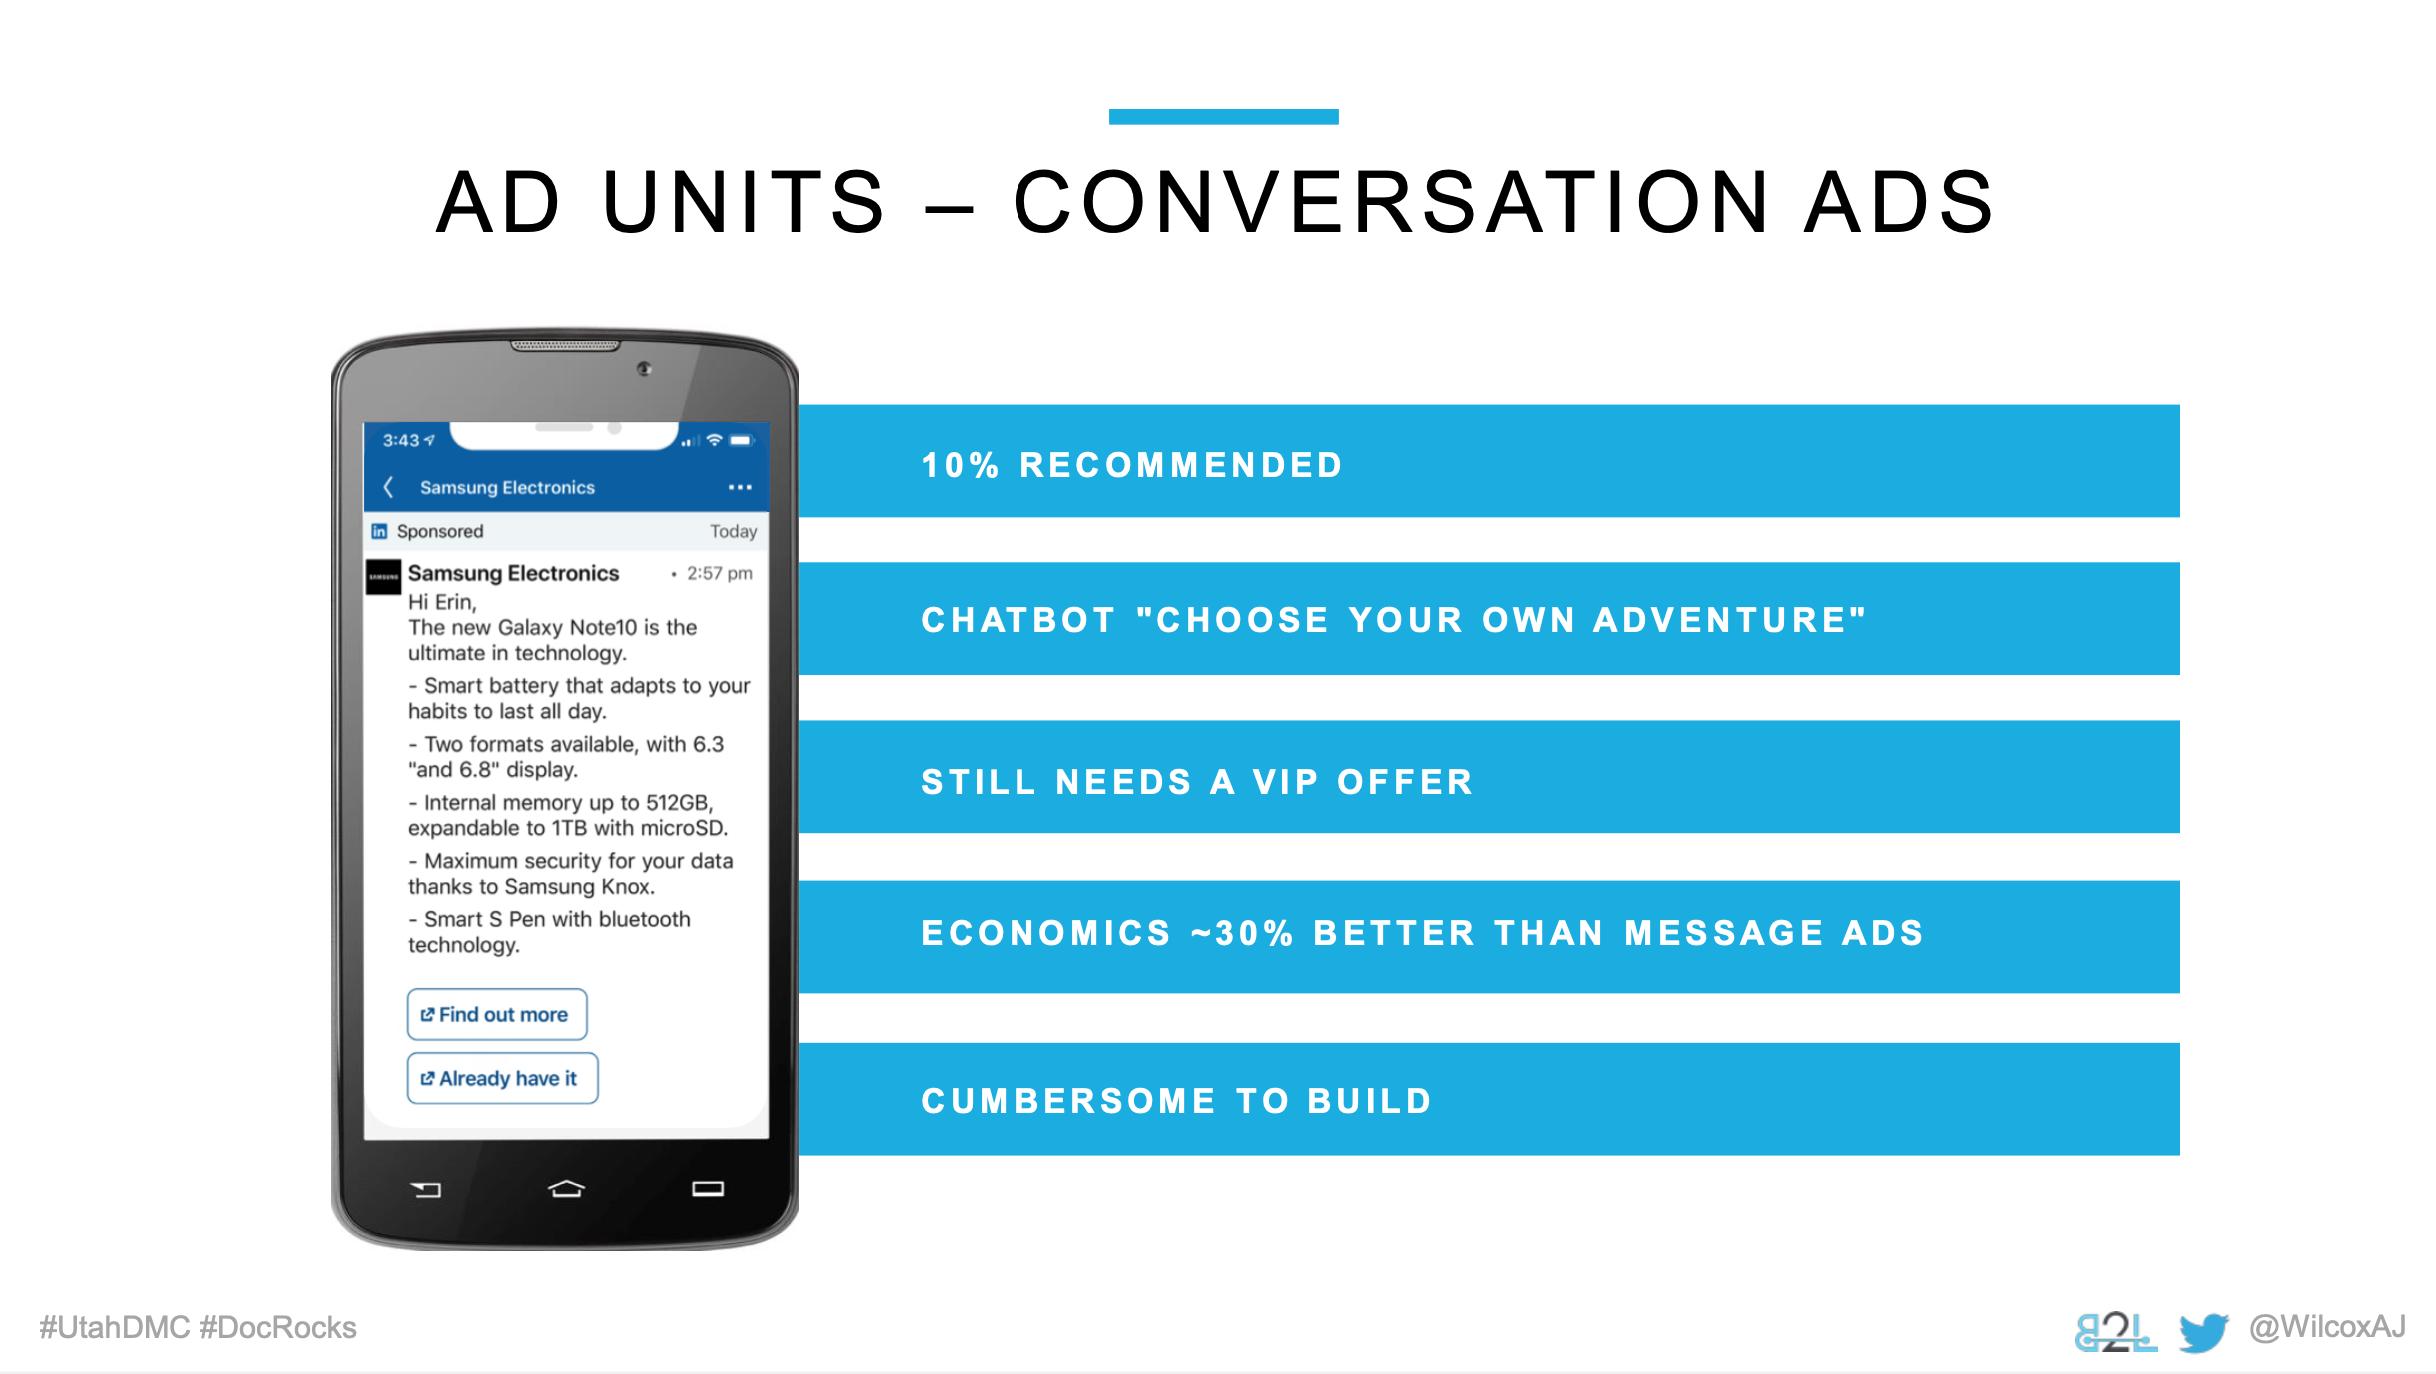 Utah DMC LinkedIn Ads - Aj Wilcox - Ad Units - Conversation Ads